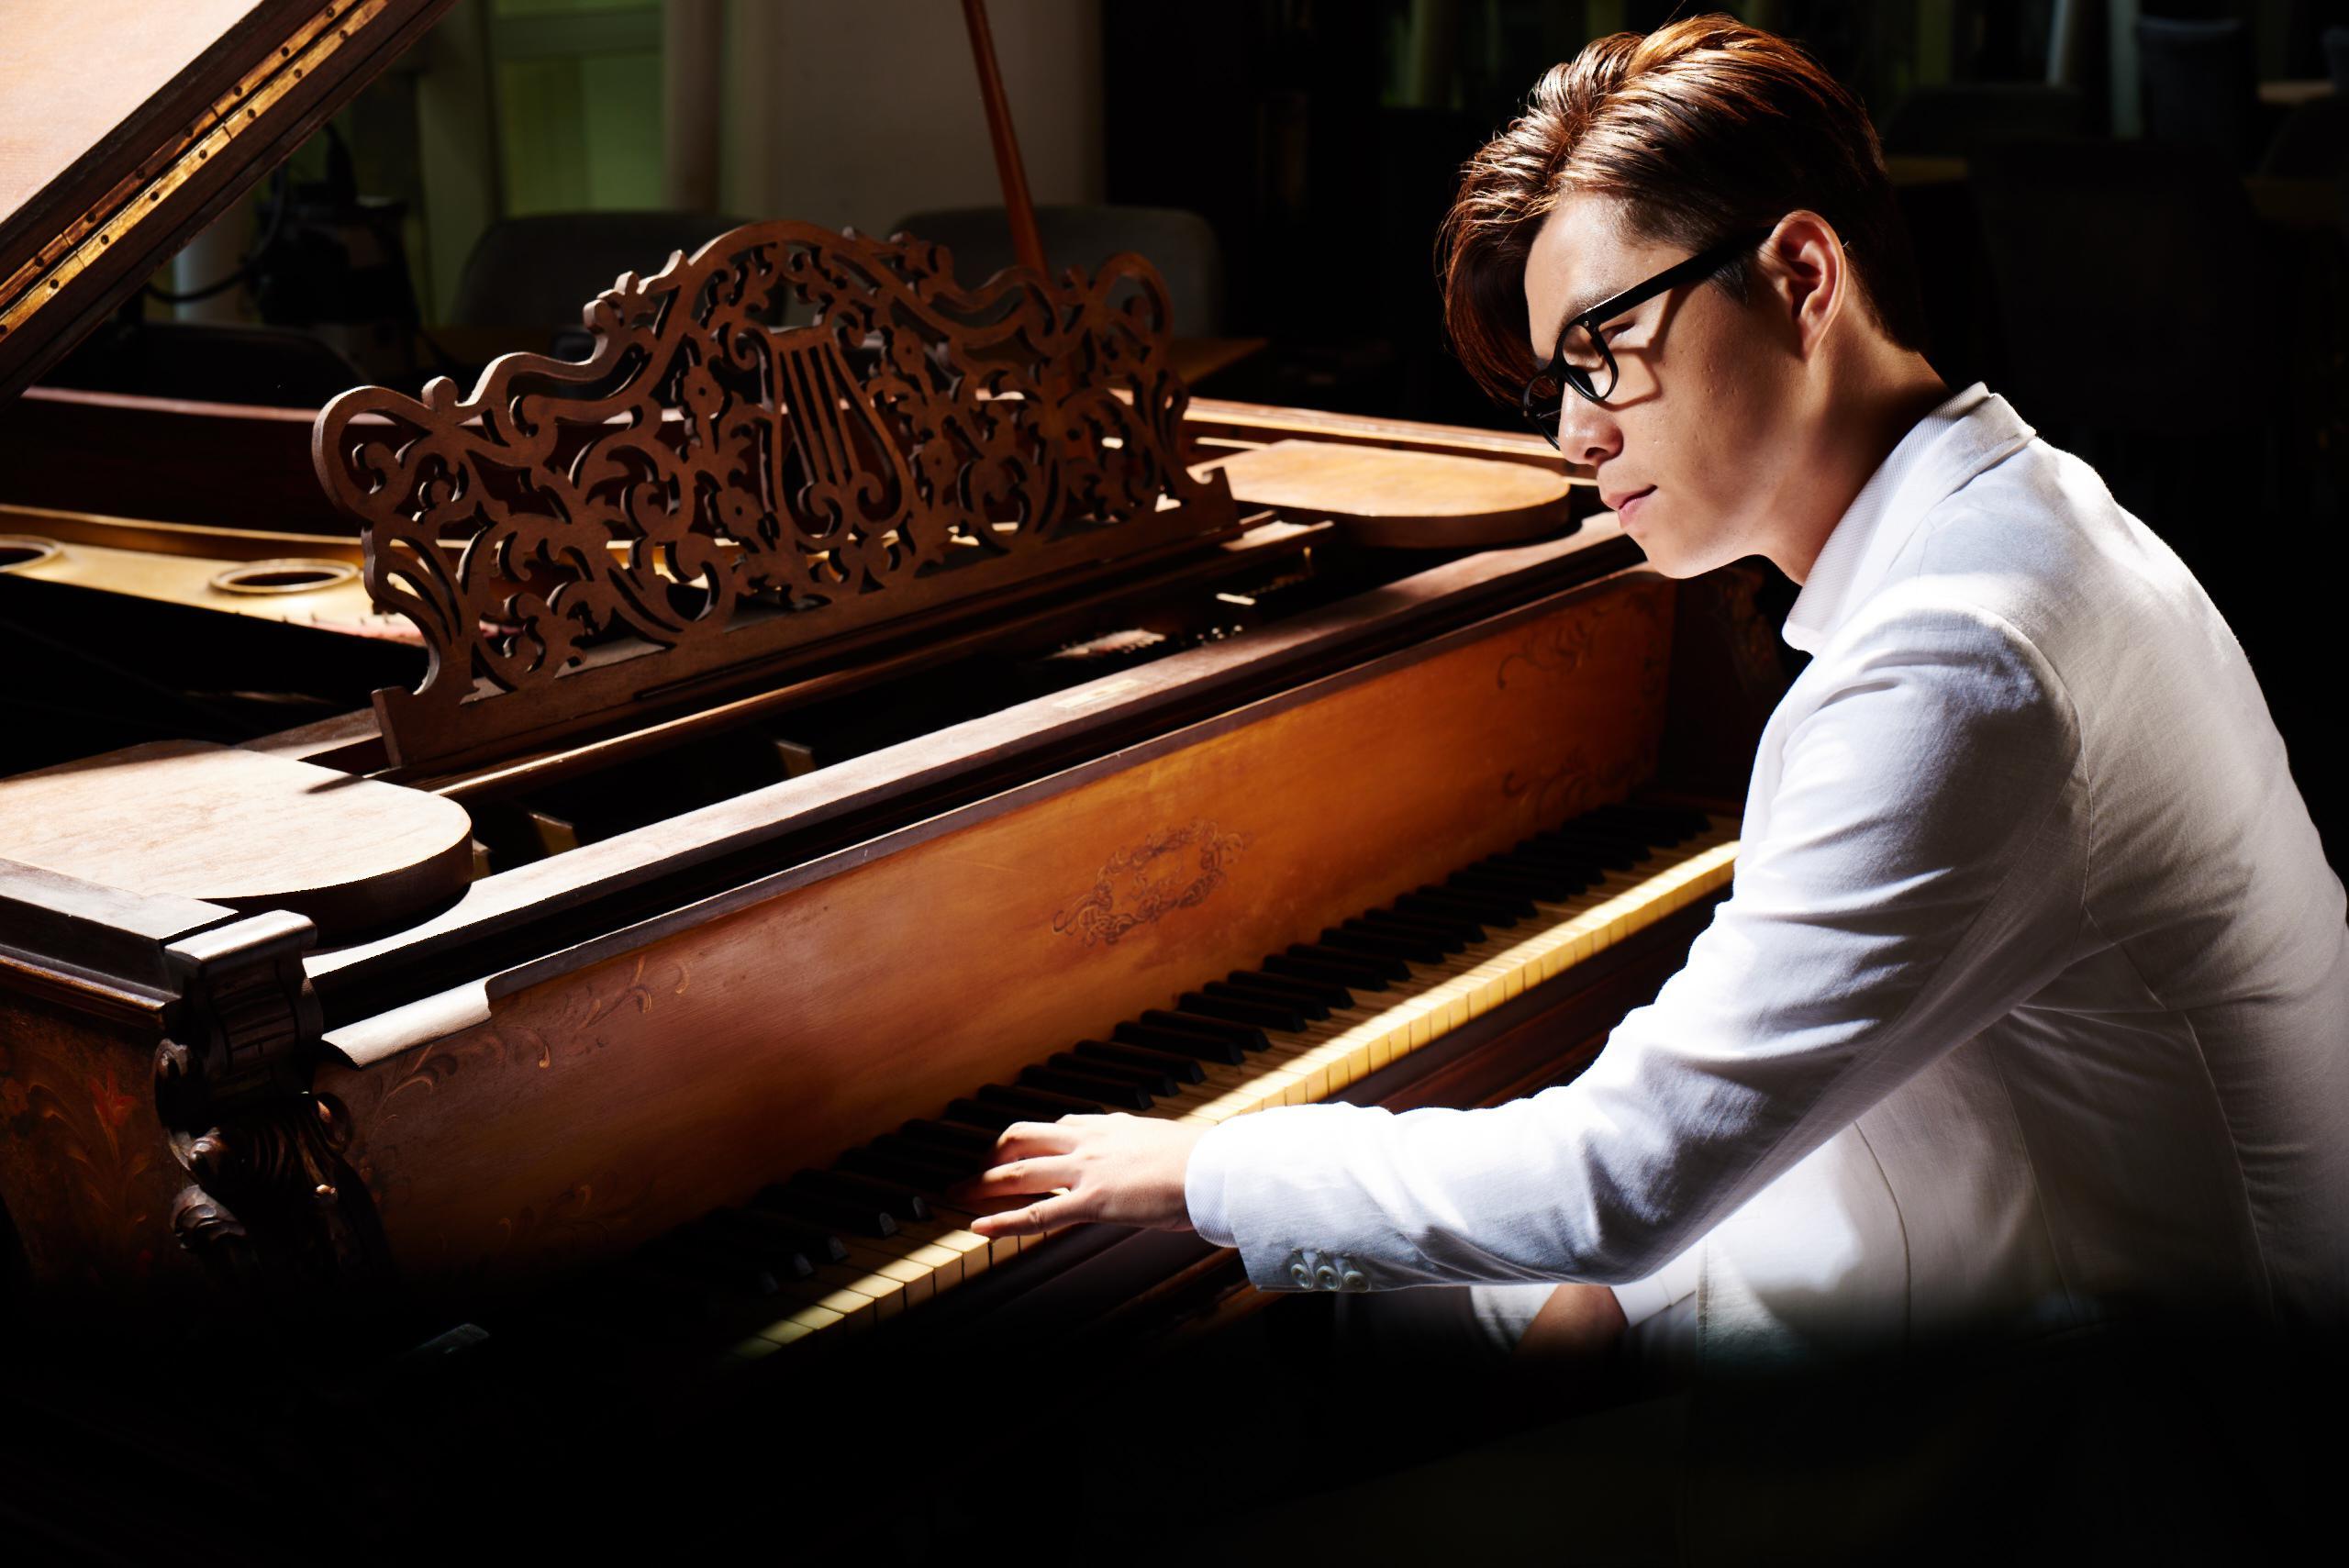 青春修炼手册钢琴曲(cover:tfboys)流行钢琴jasonpianocover